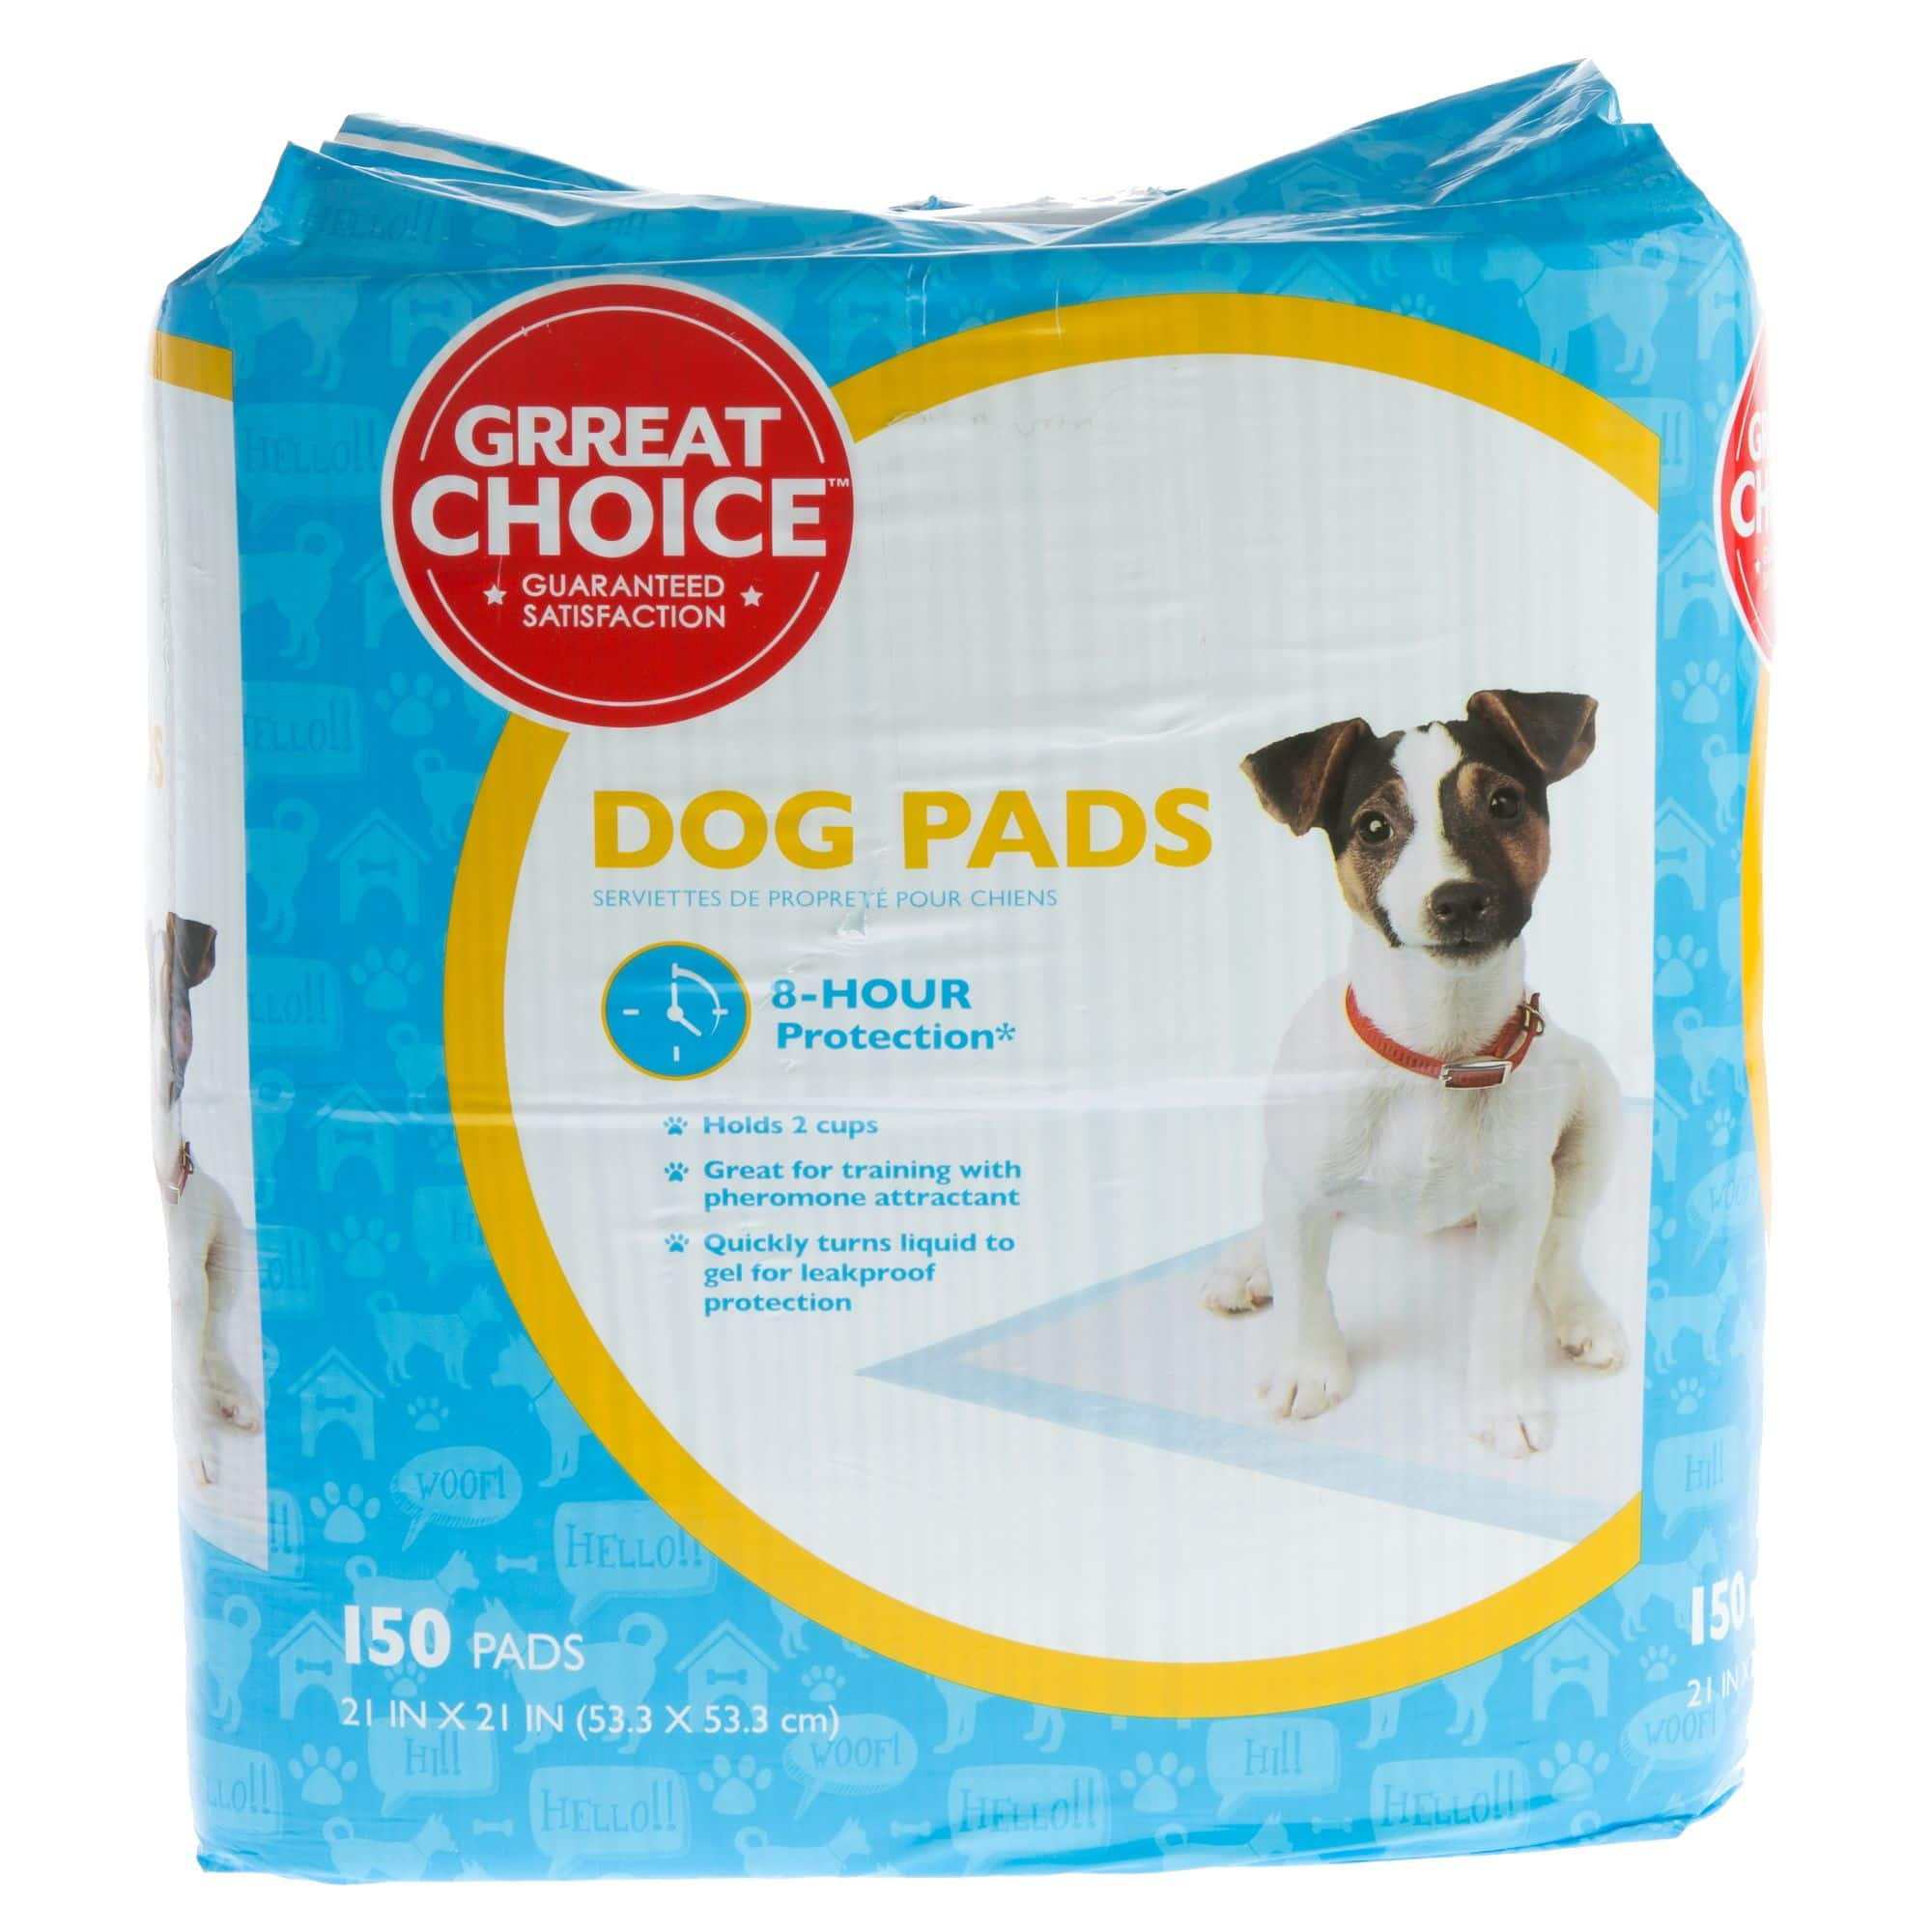 Grreat Choice® Dog Pads 150 ct $13.49 @ Petsmart